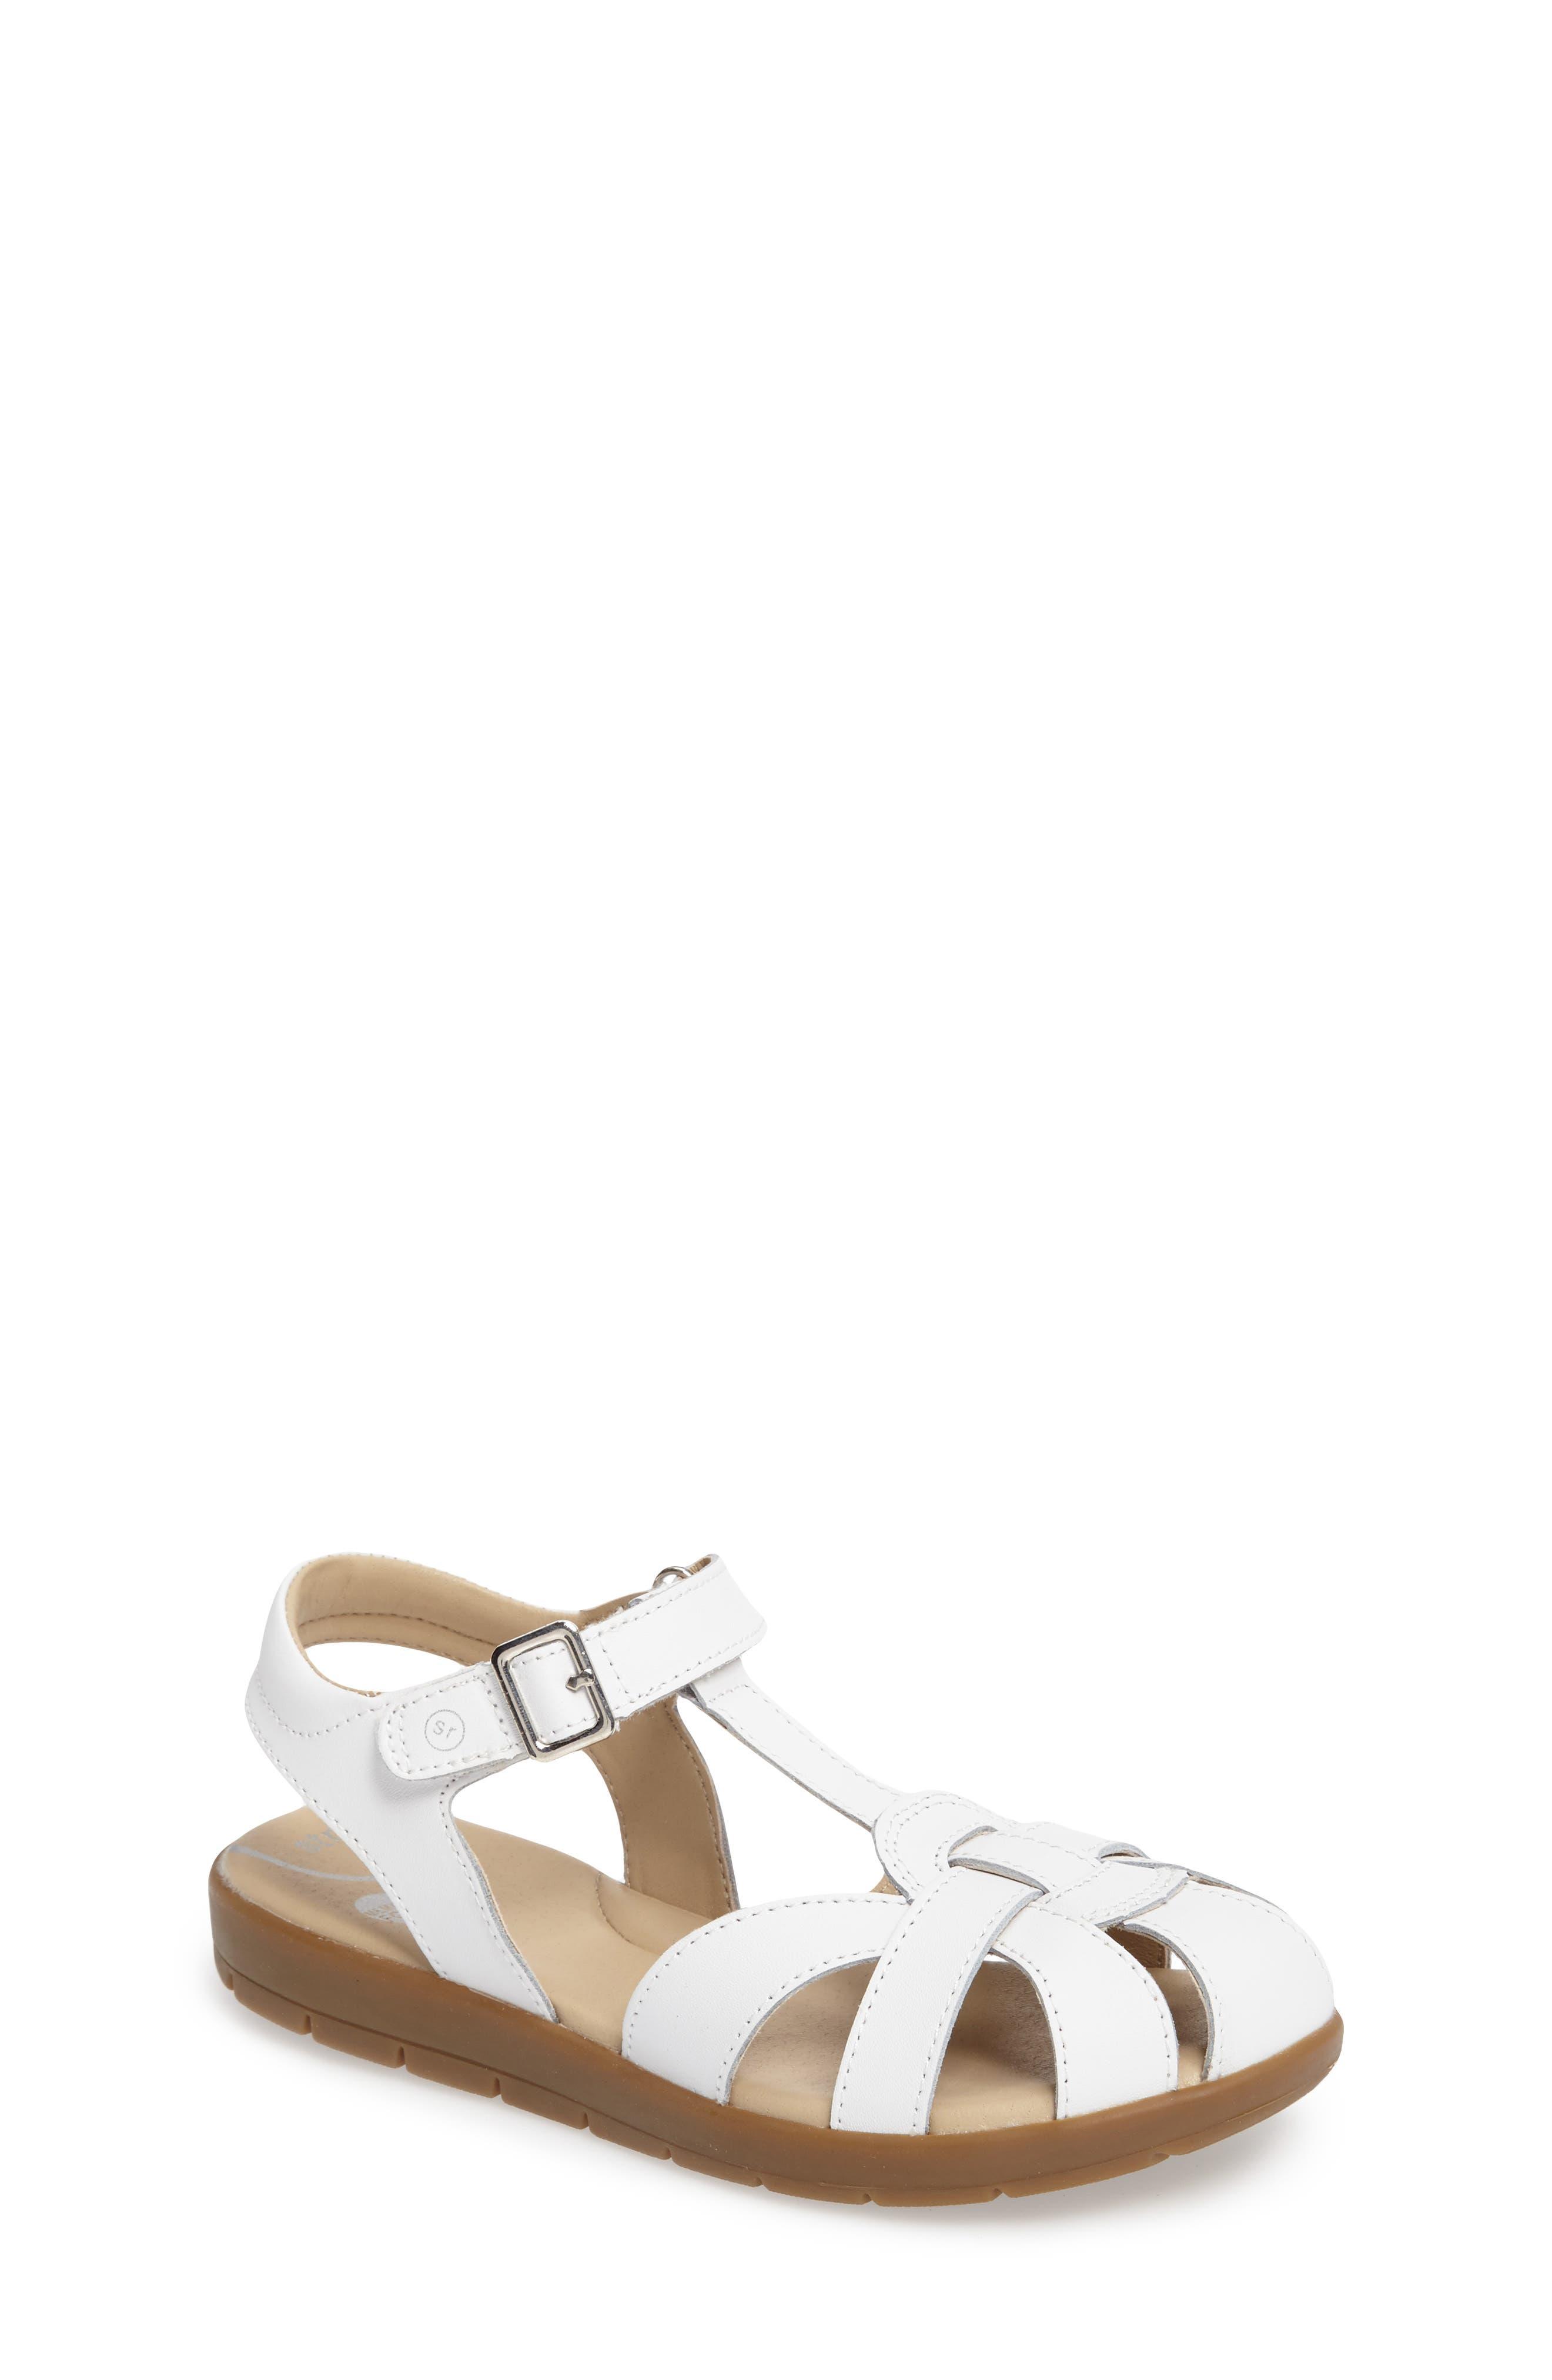 Summer Time Sandal,                         Main,                         color, WHITE